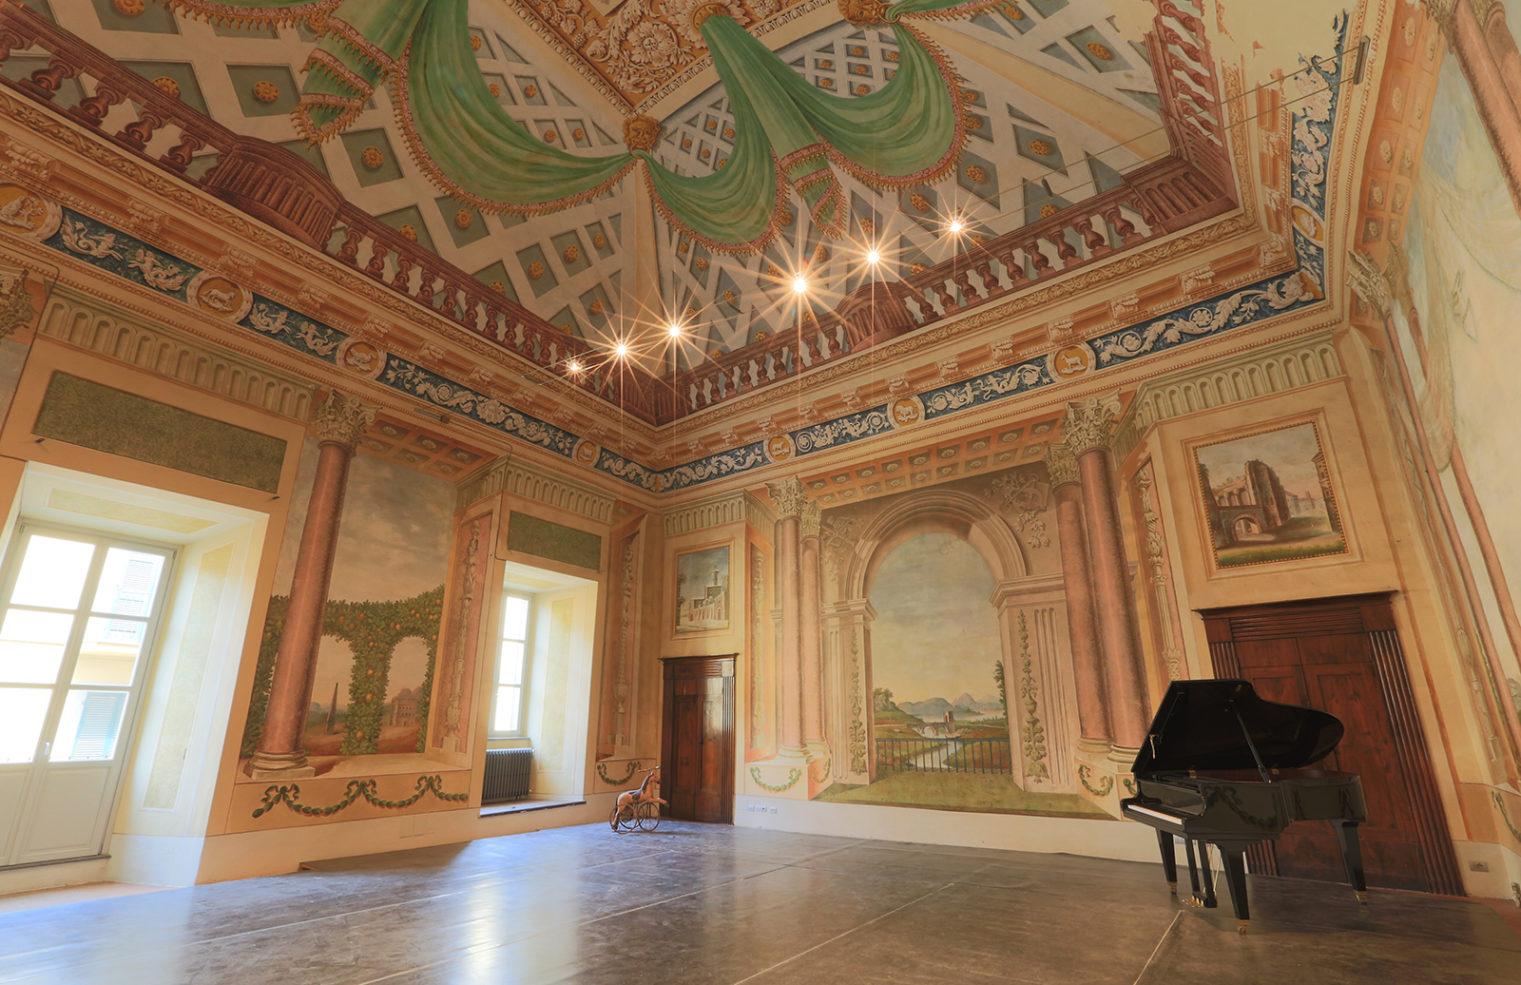 Italian property with a dance floor